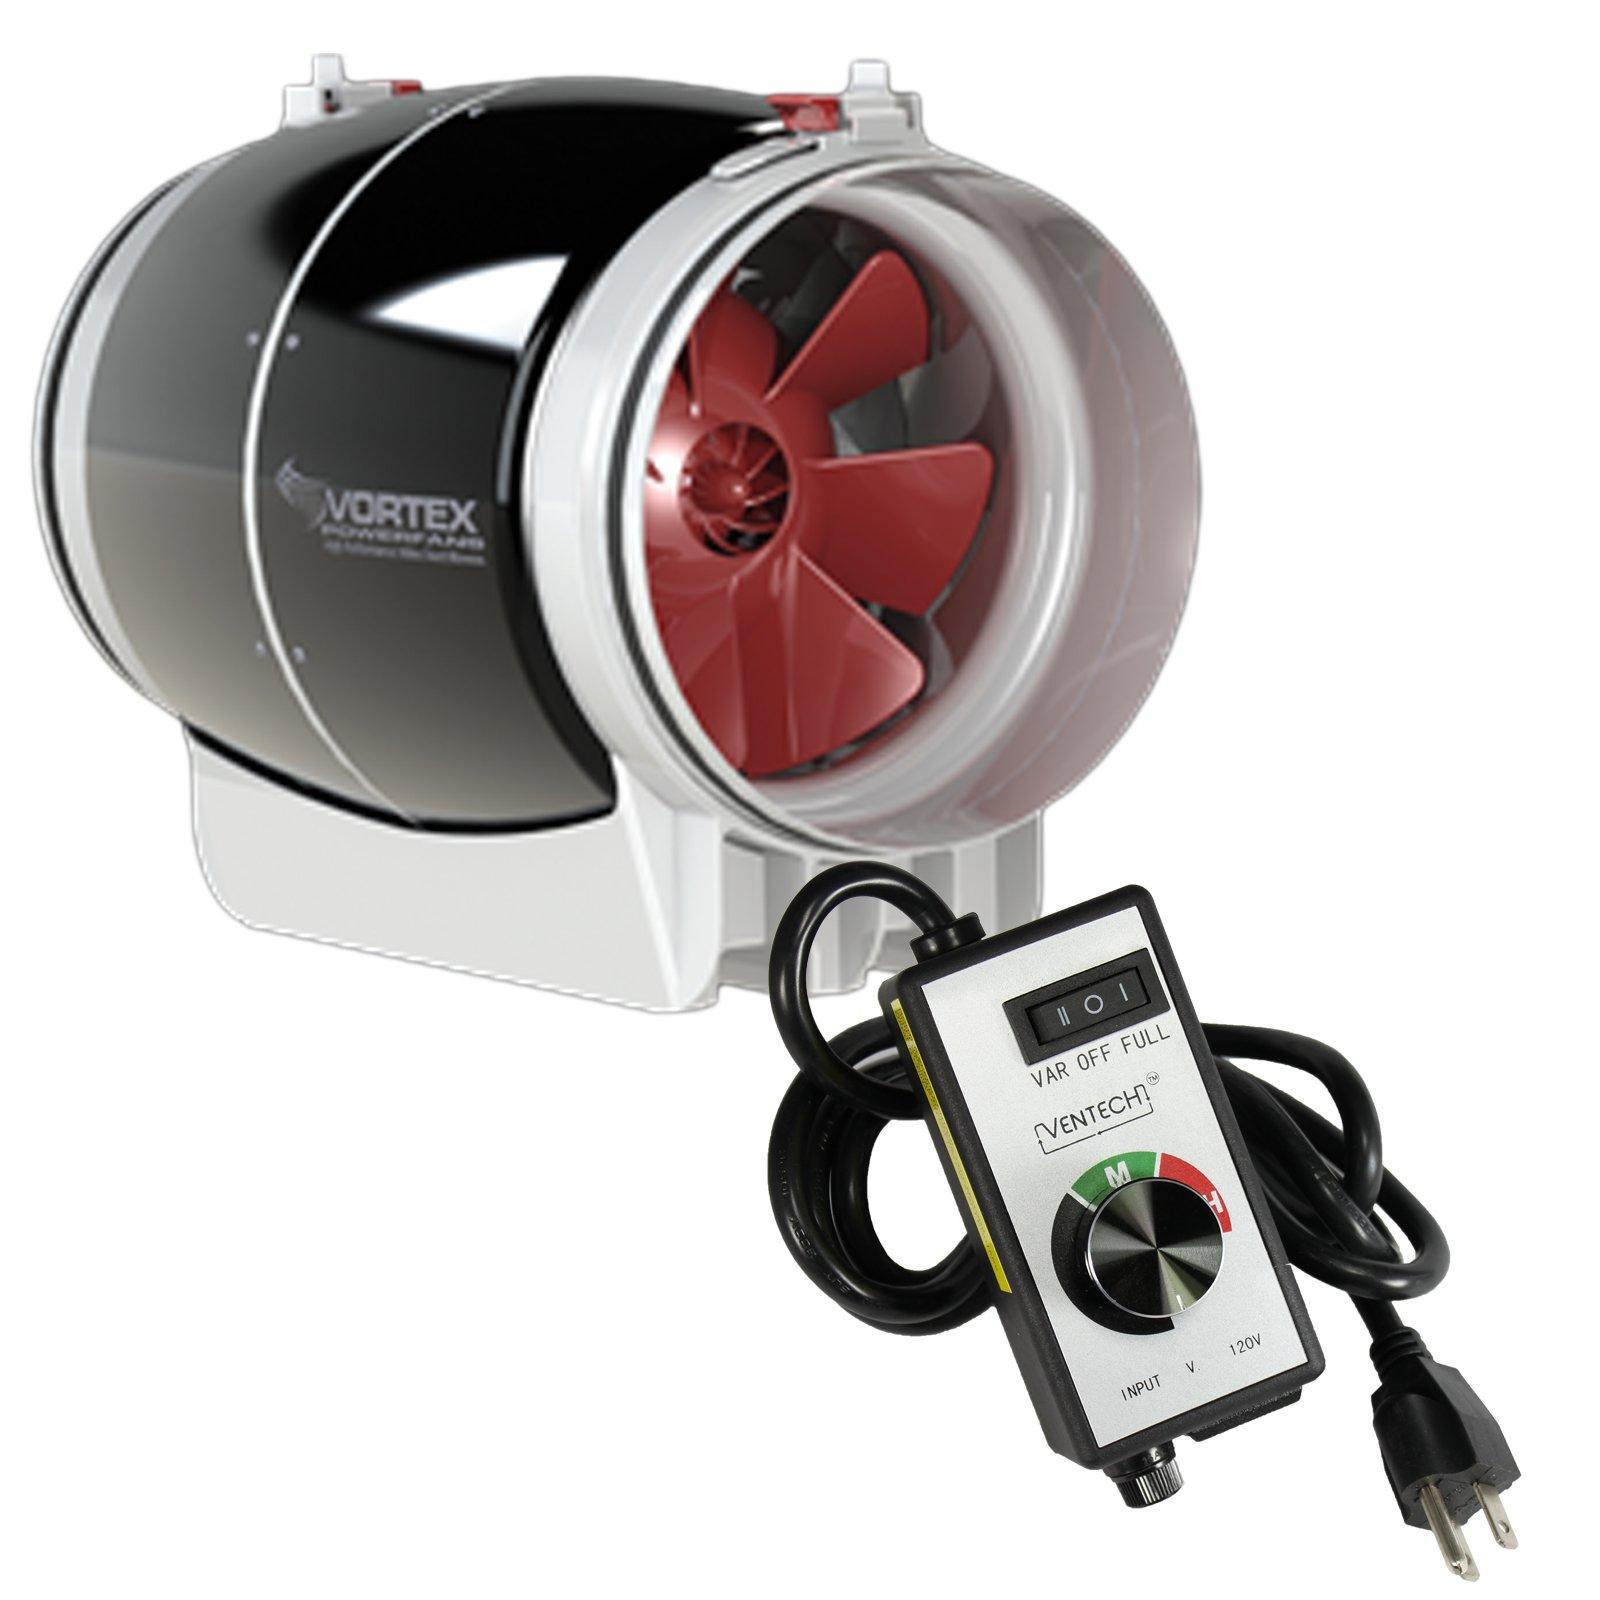 6'' inch Vortex S Line S-600 Power Fan 347 CFM by Atmosphere + VenTech Variable Fan Speed Controller